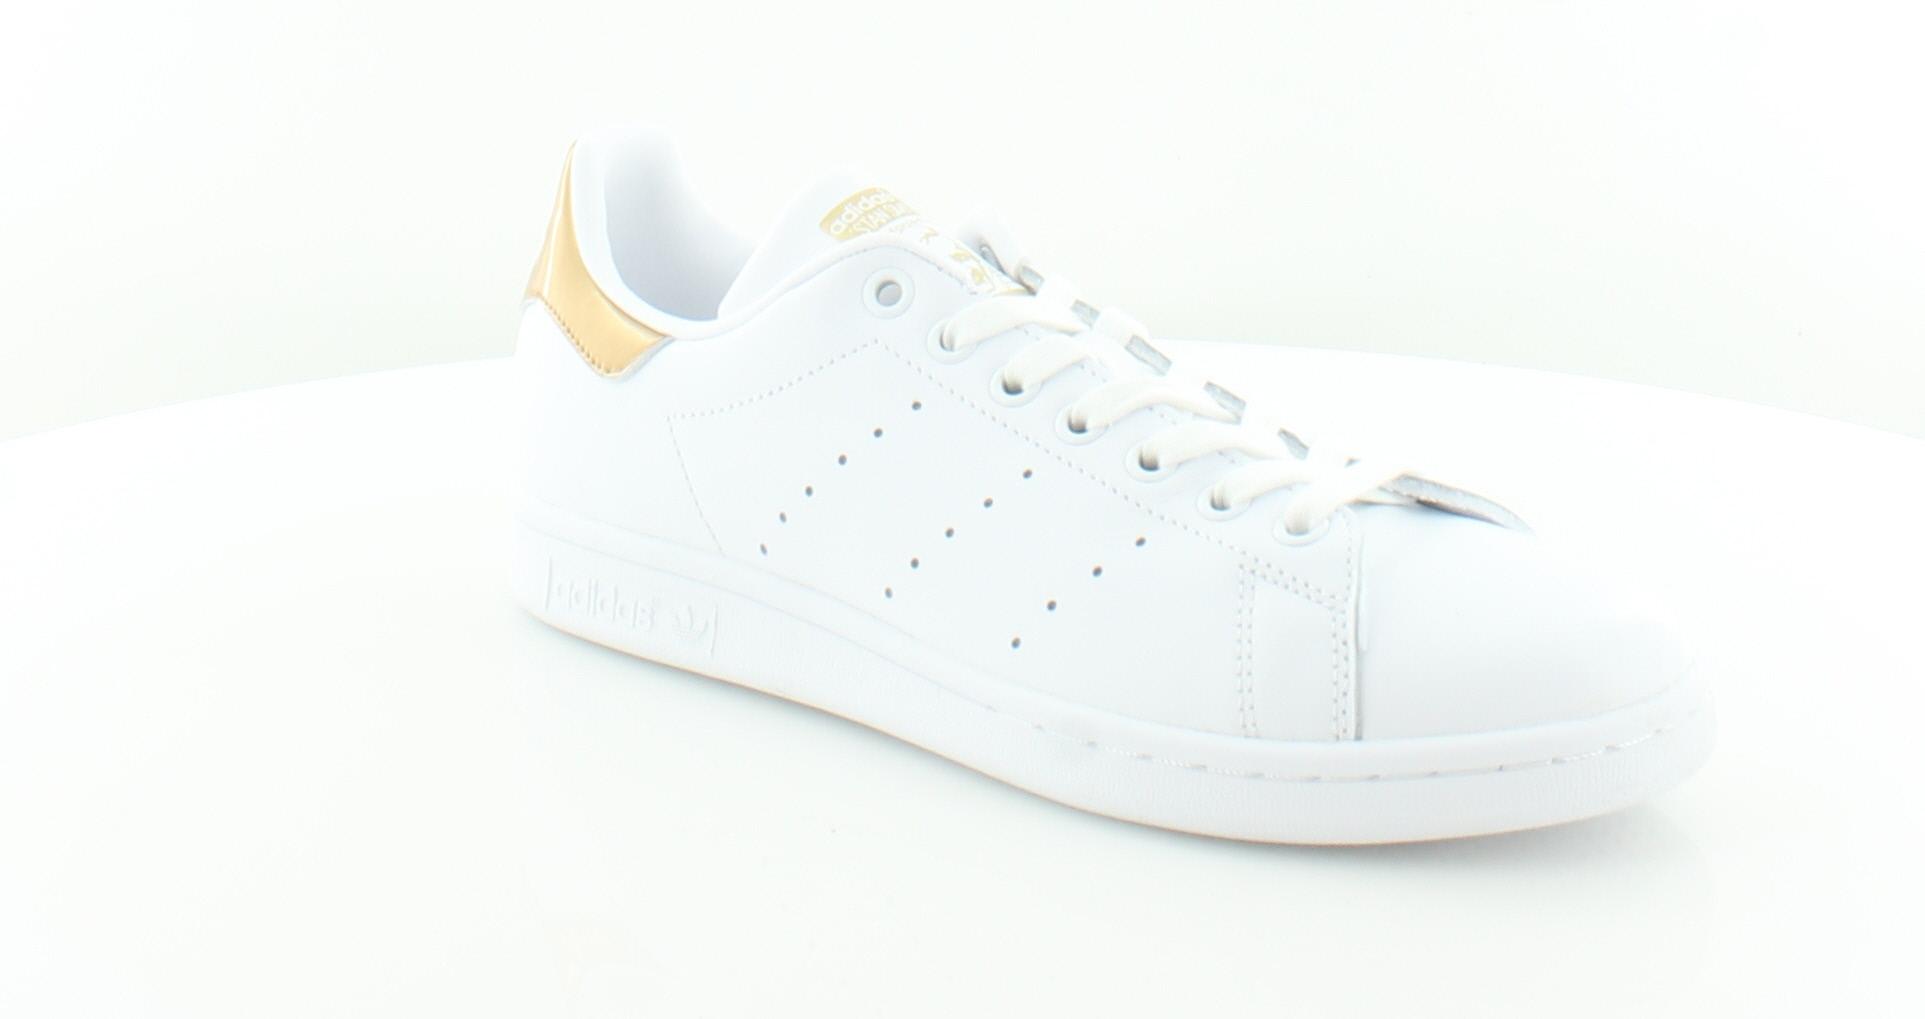 ec5ba1044 Adidas New Stan Smith White Womens Shoes Size 11 M Fashion Sneakers ...